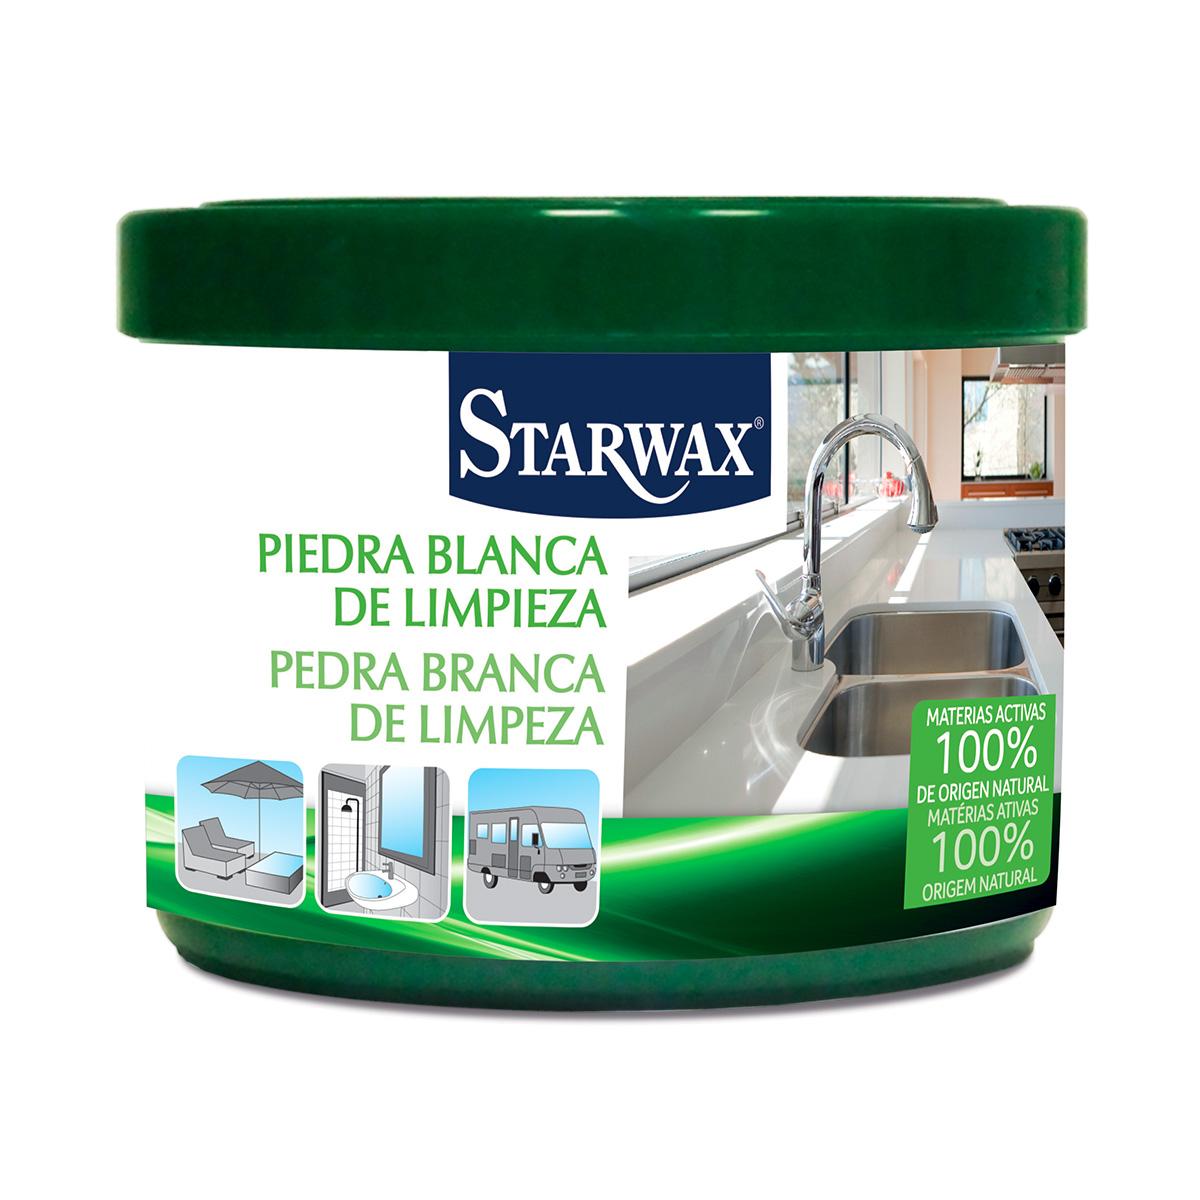 Piedra blanca de limpieza - Starwax